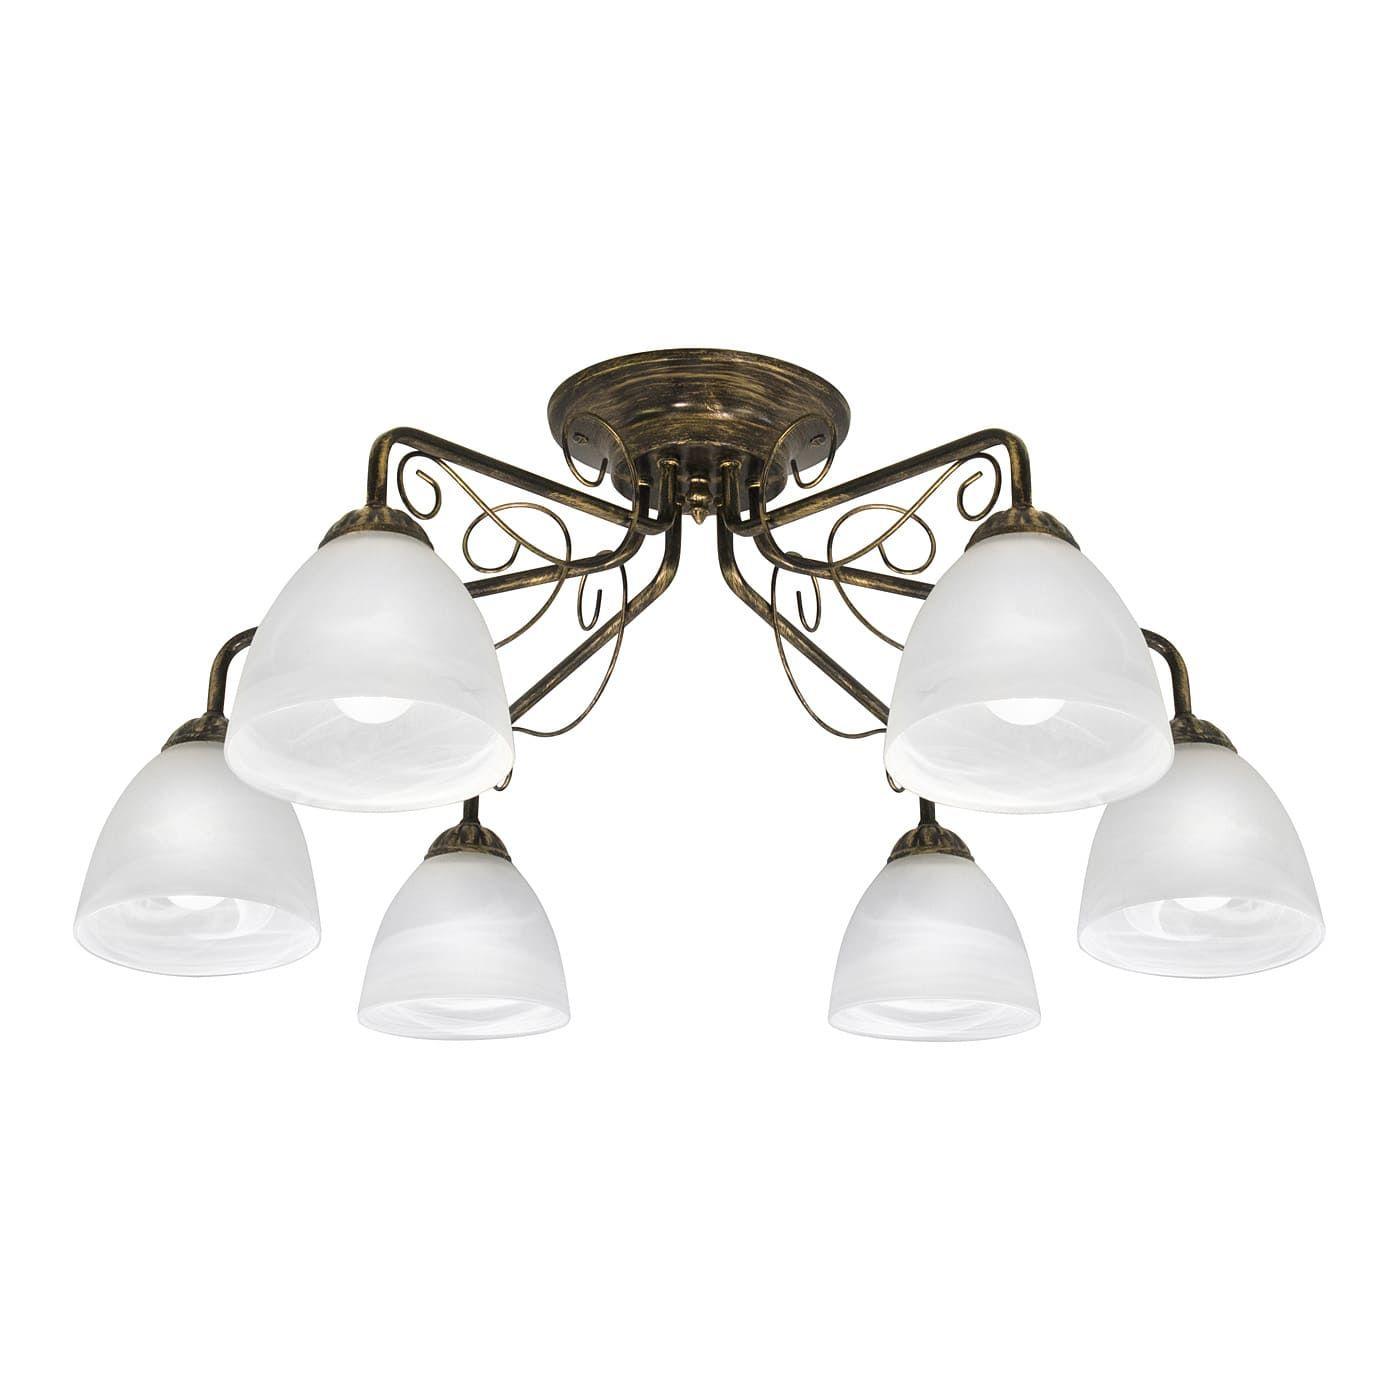 PETRASVET / Ceiling chandelier S2206-6, 6xE27 max. 60W